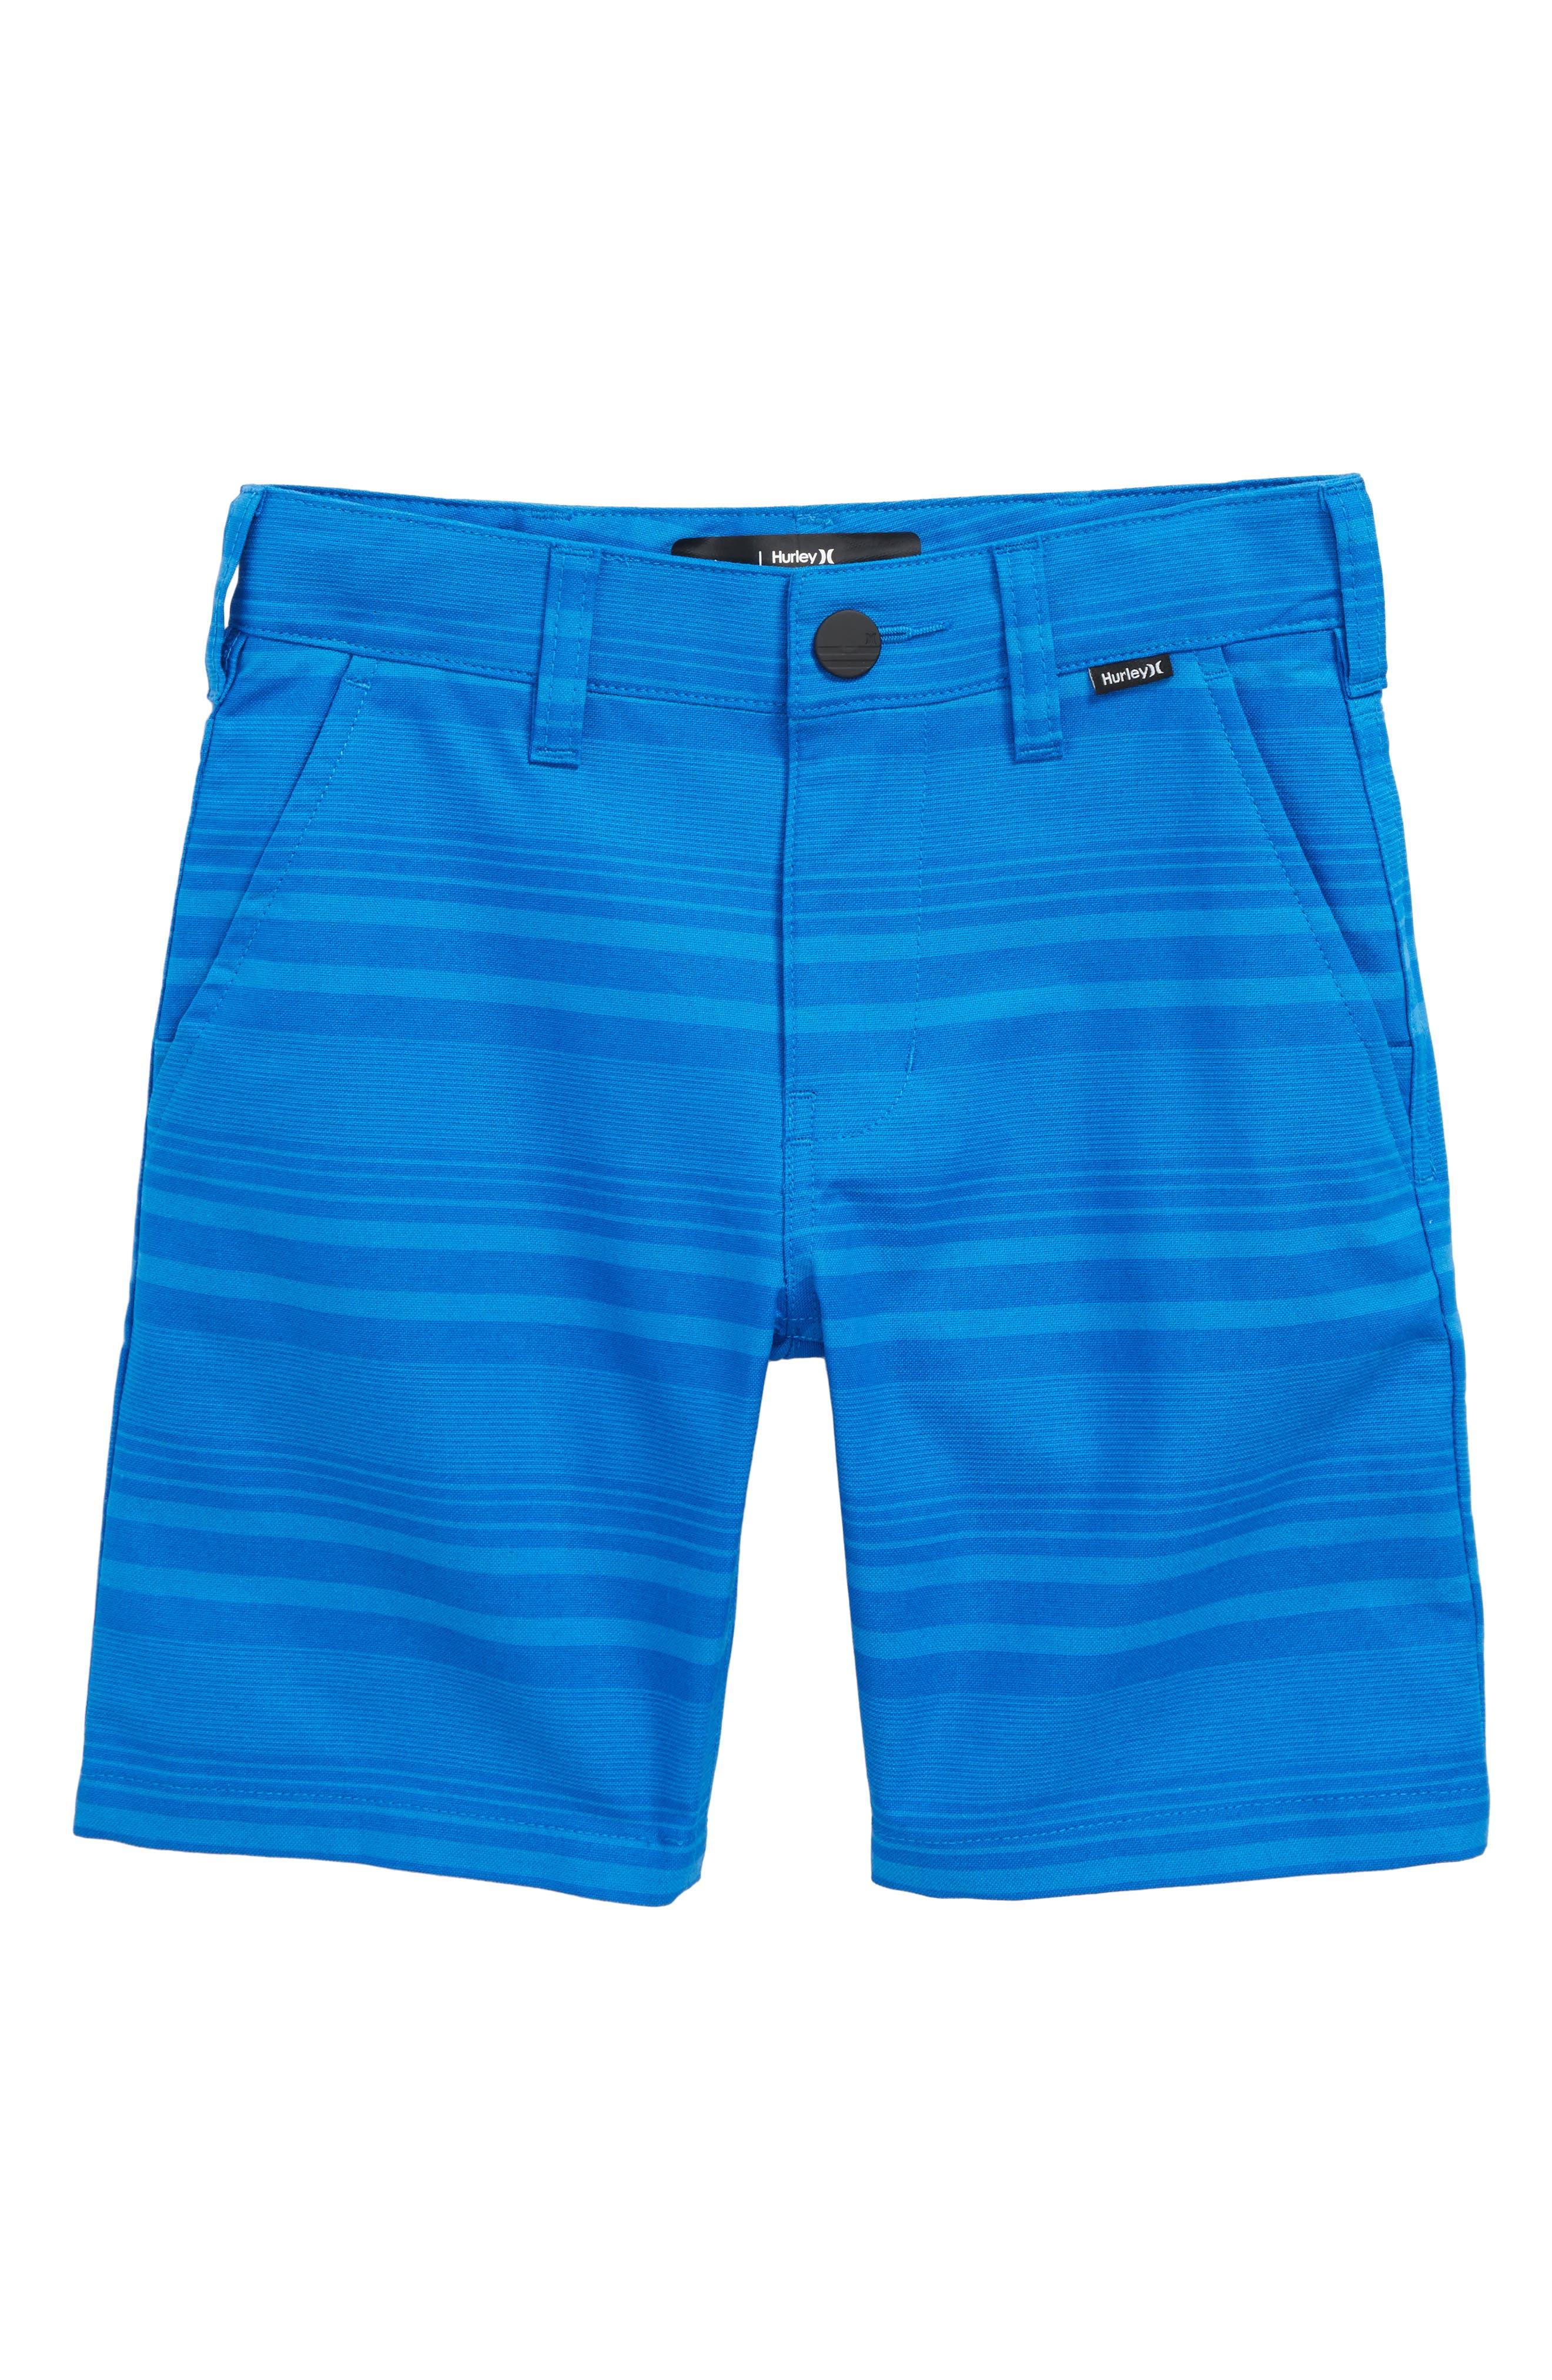 Jones Hybrid Shorts,                         Main,                         color, 400